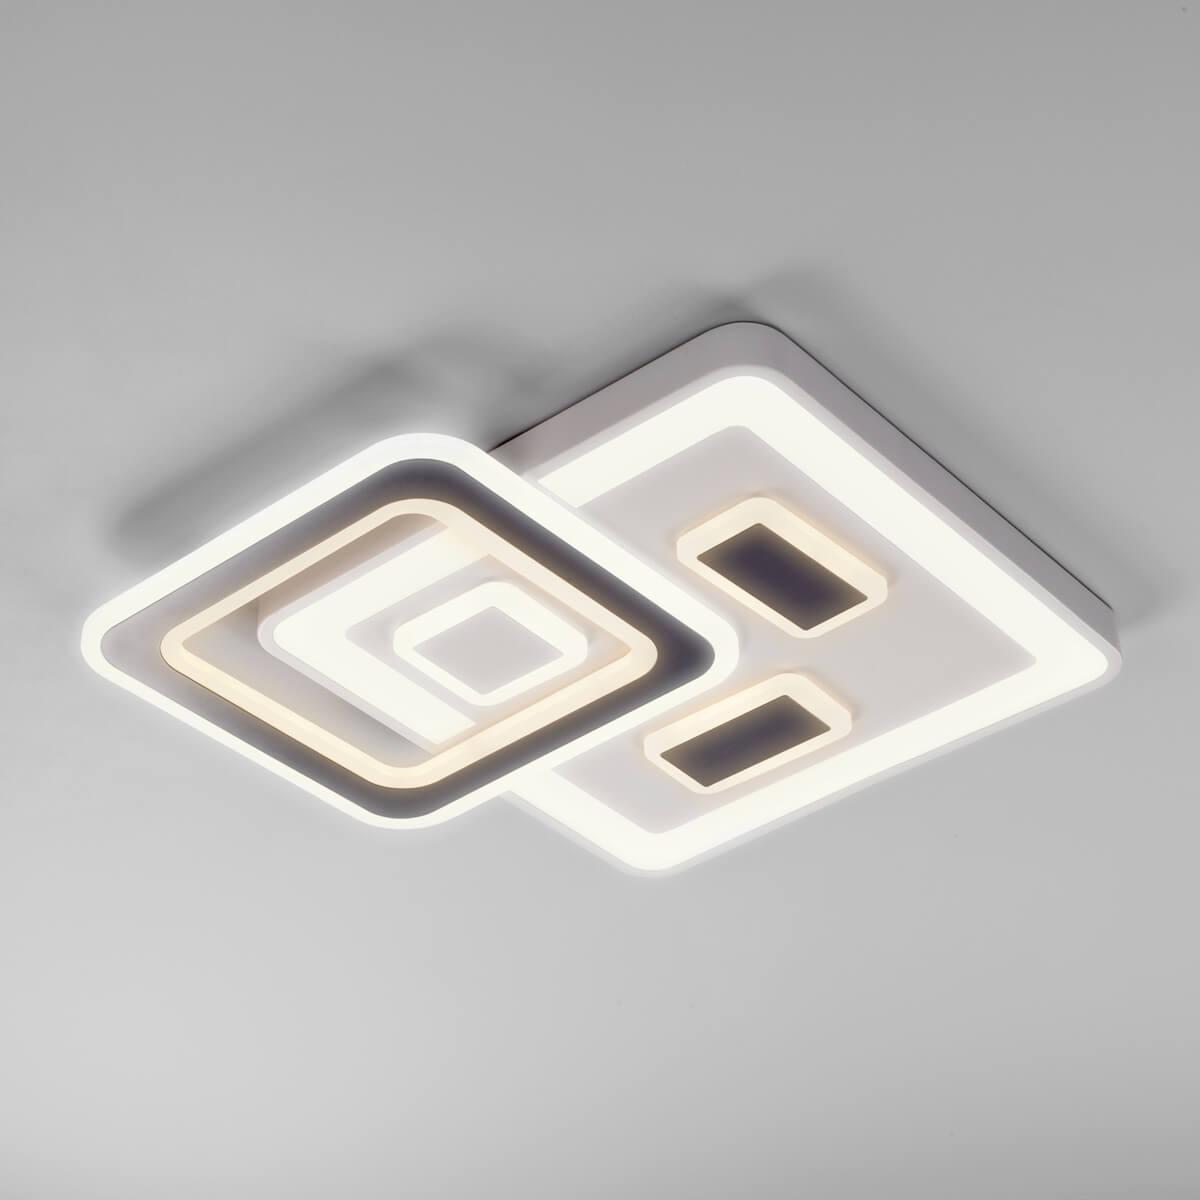 Светильник Eurosvet 90156/1 белый Concord